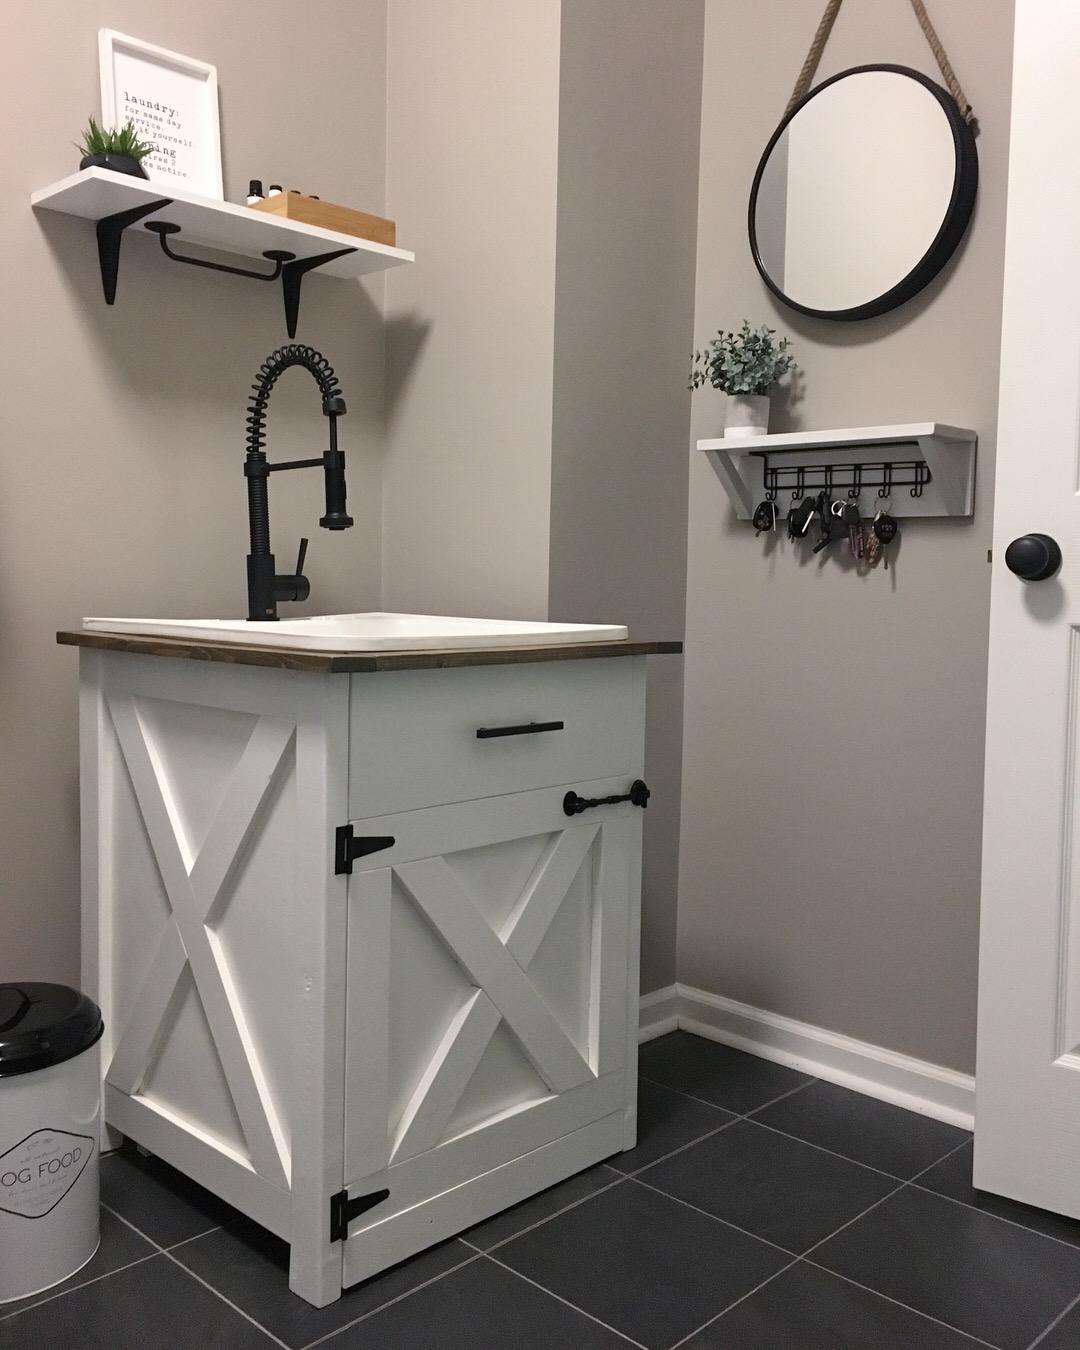 utility sink cabinet.JPG